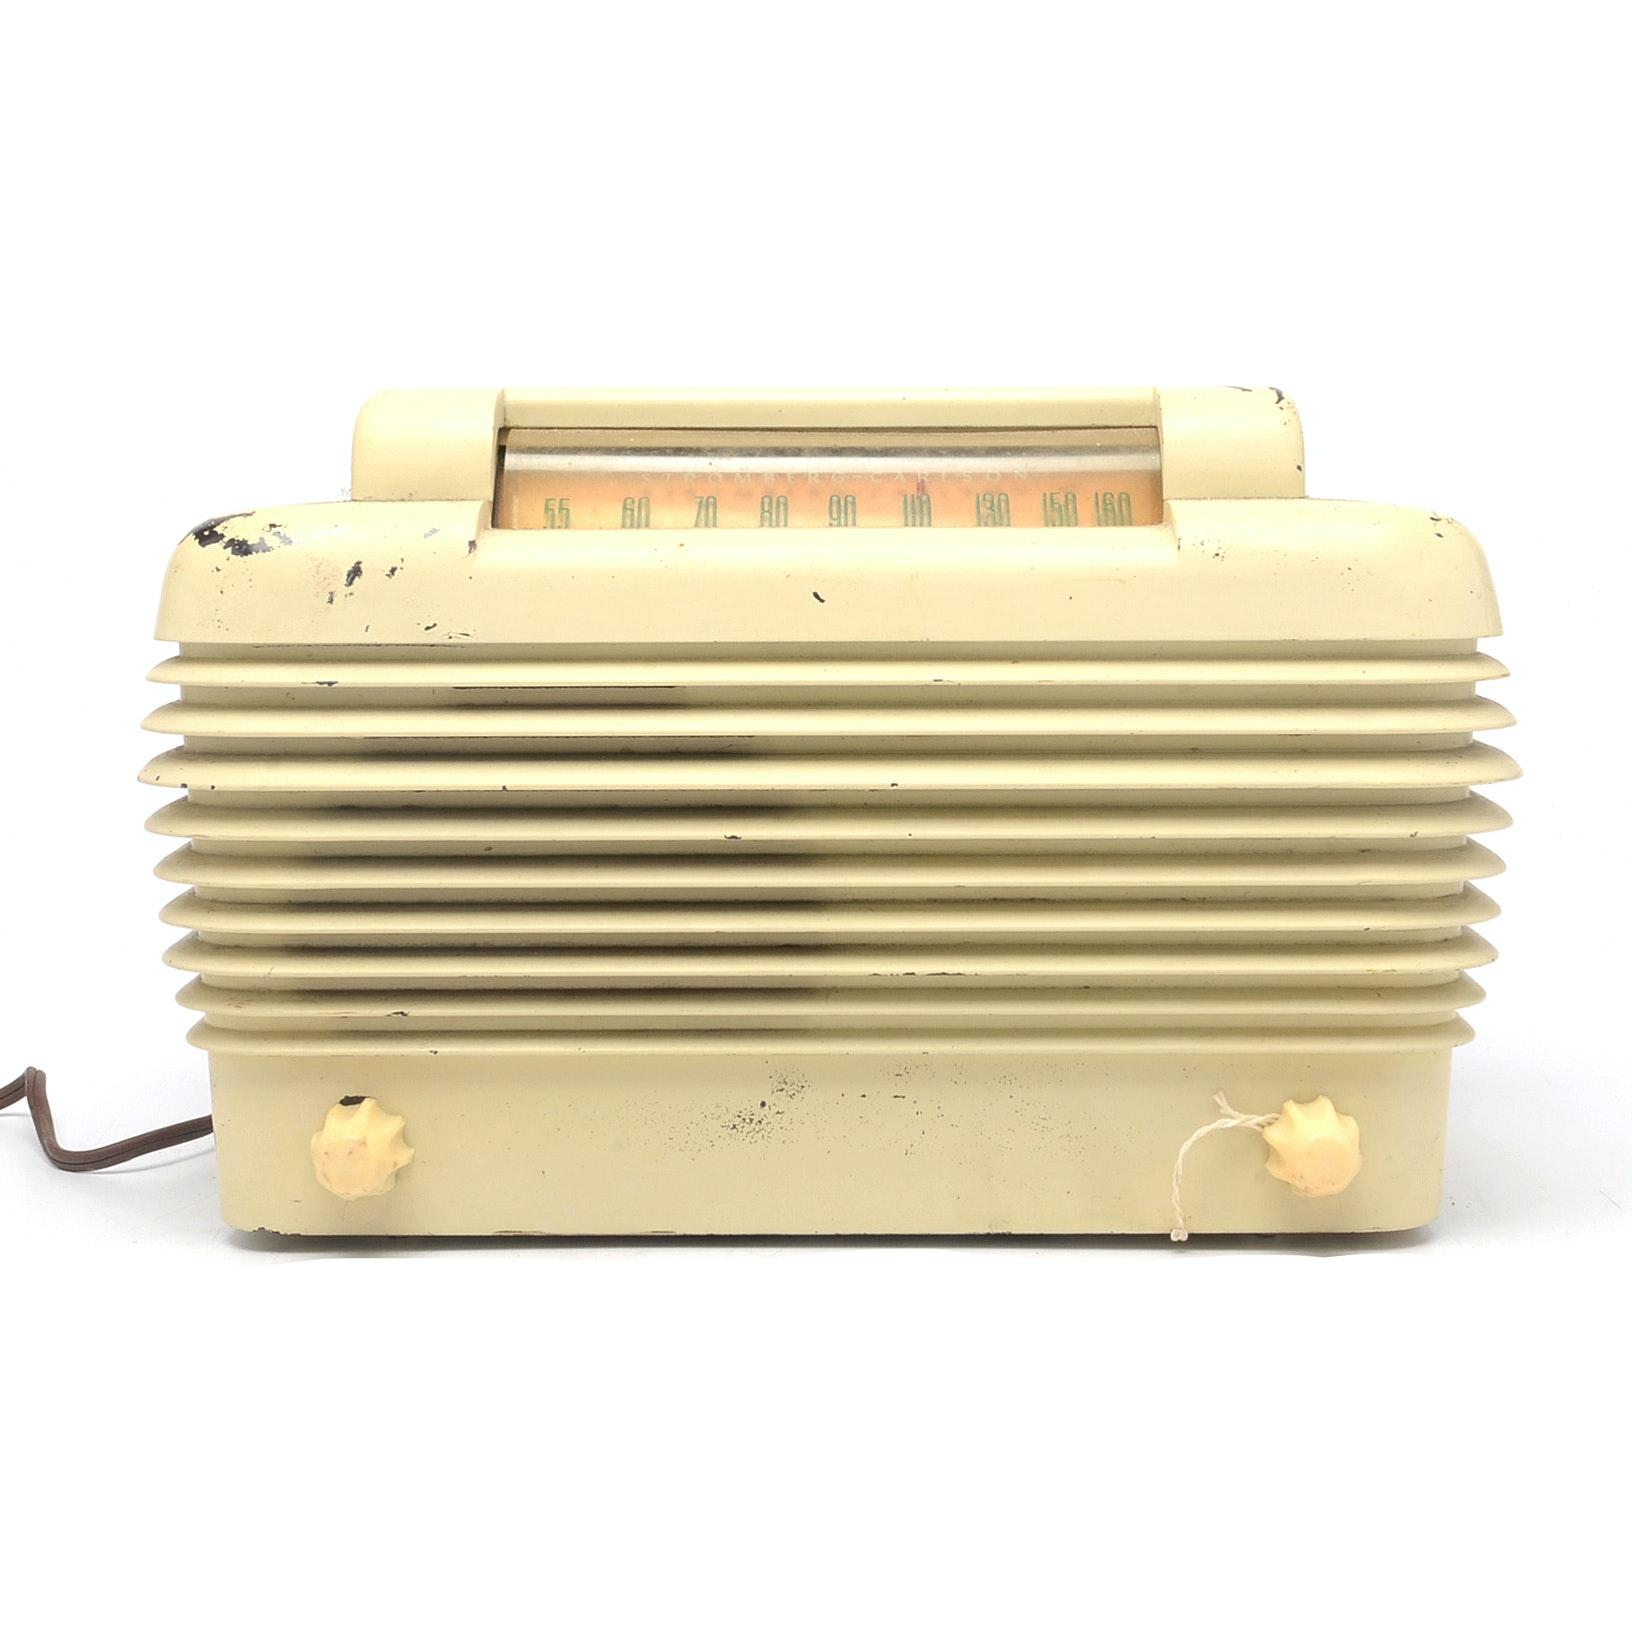 Stromberg-Carlson Radio